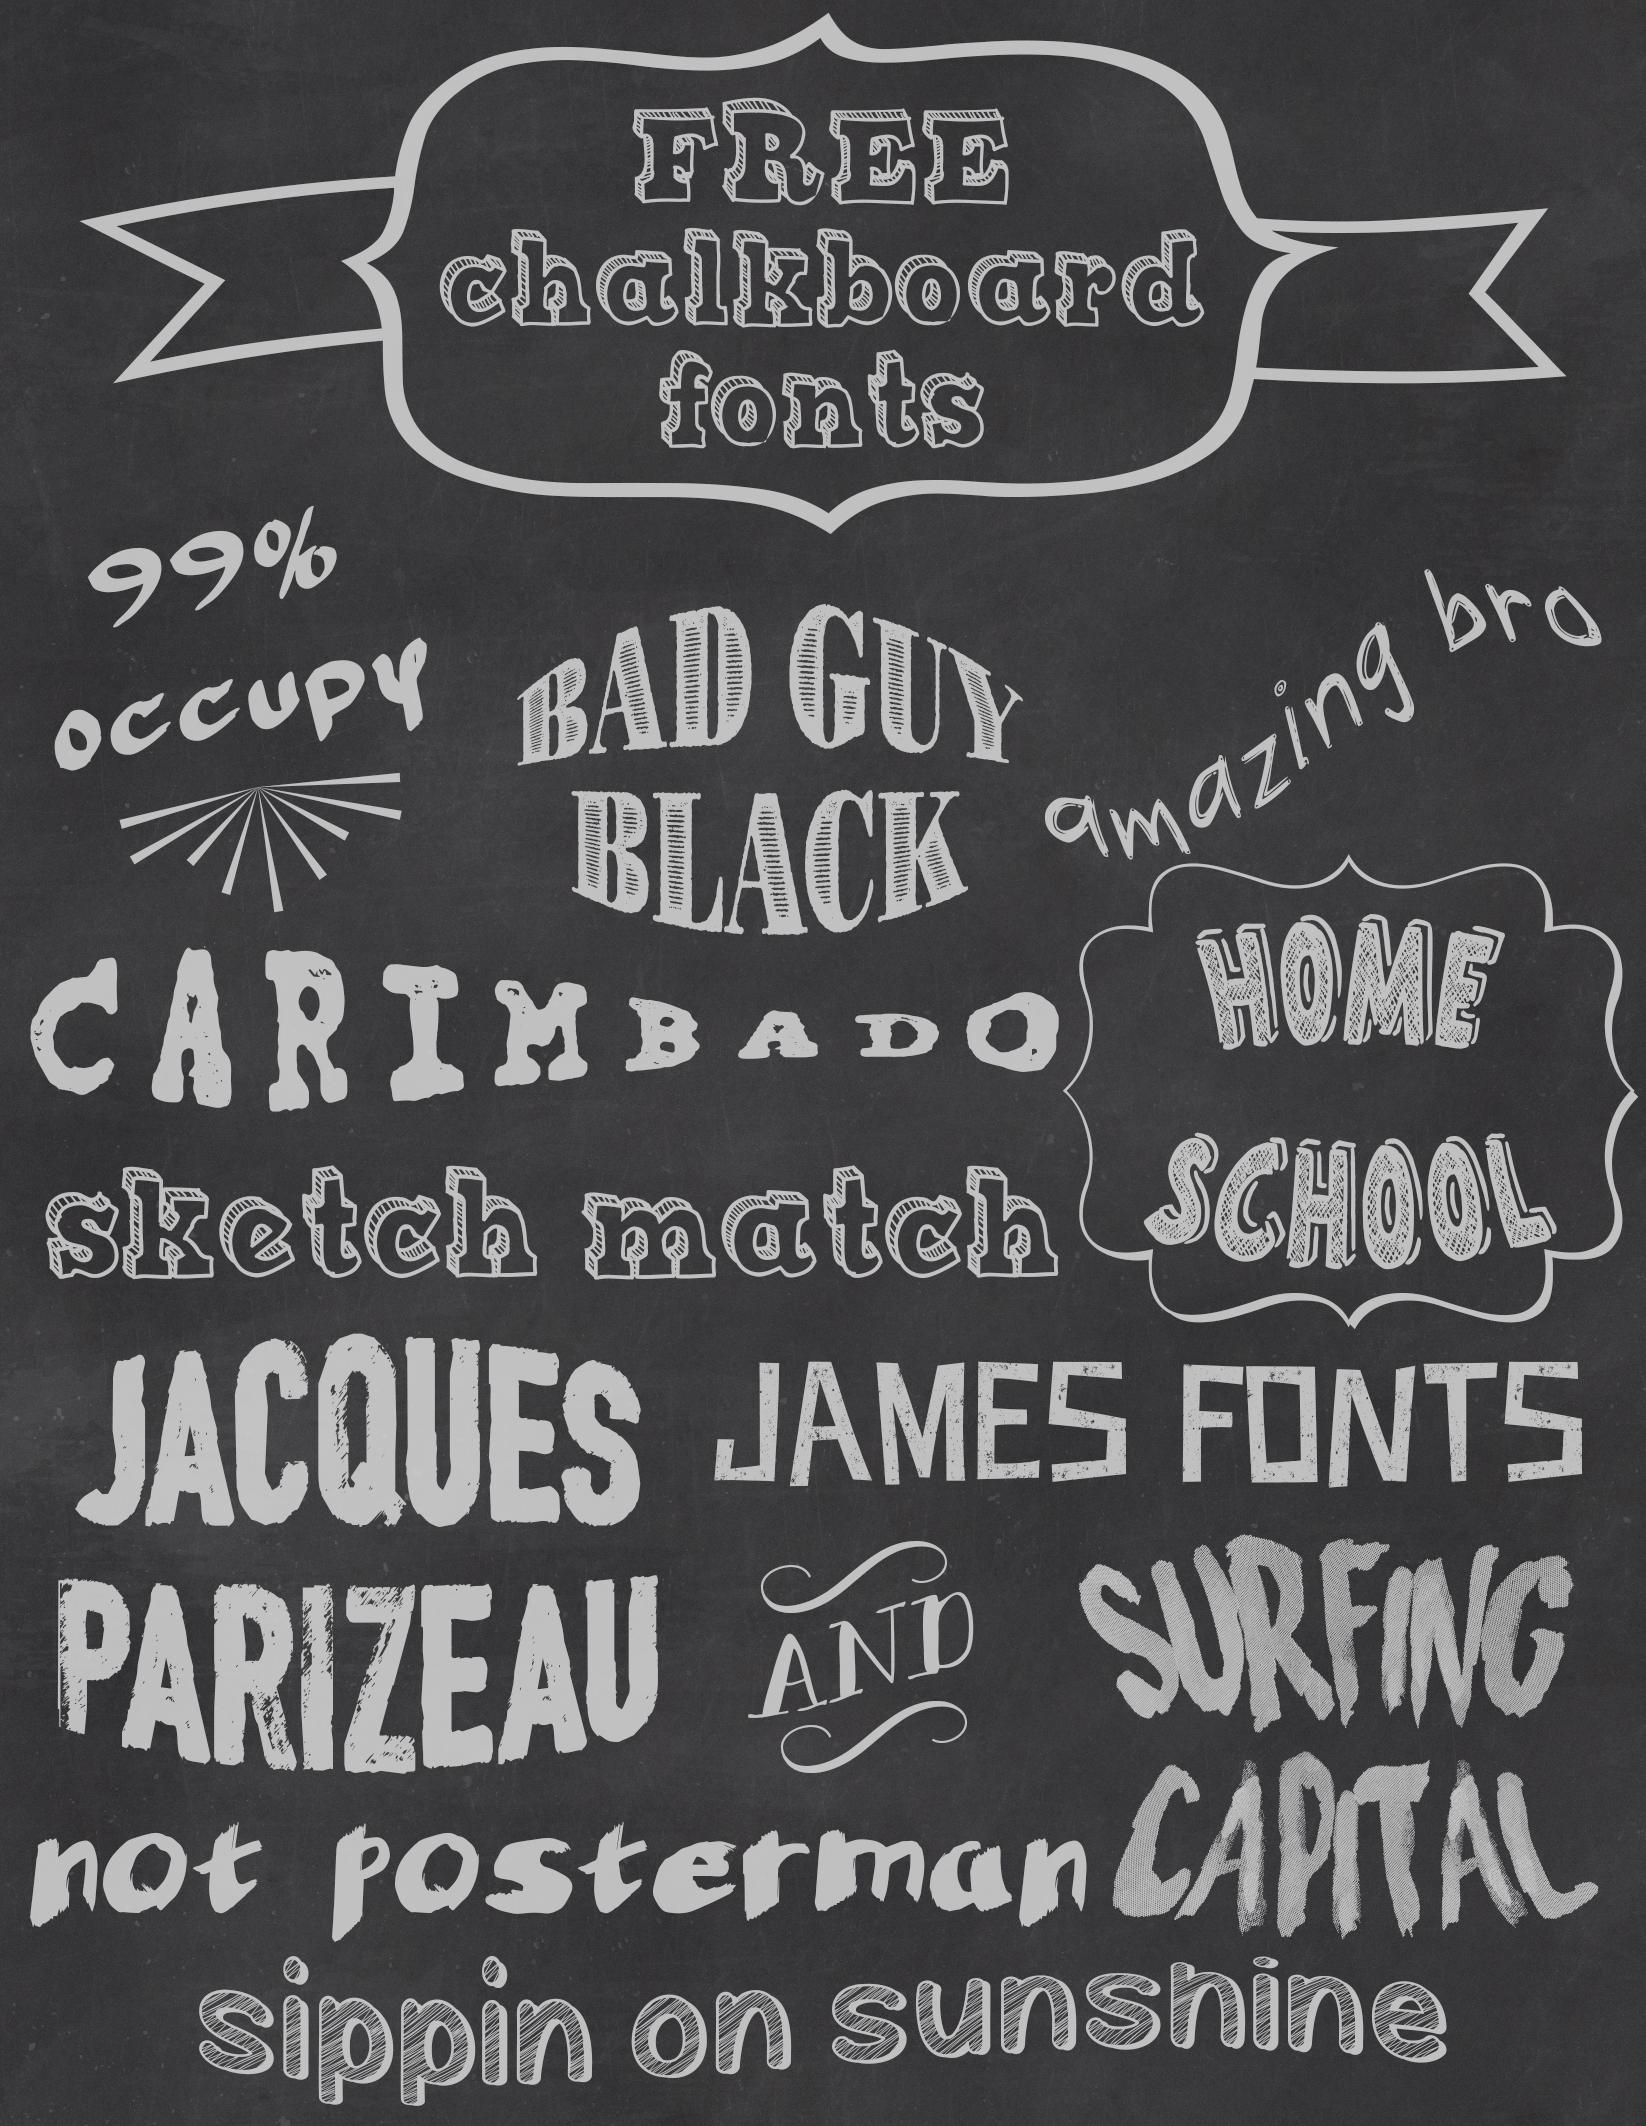 Free Chalkboard Fonts | Sarah Halstead